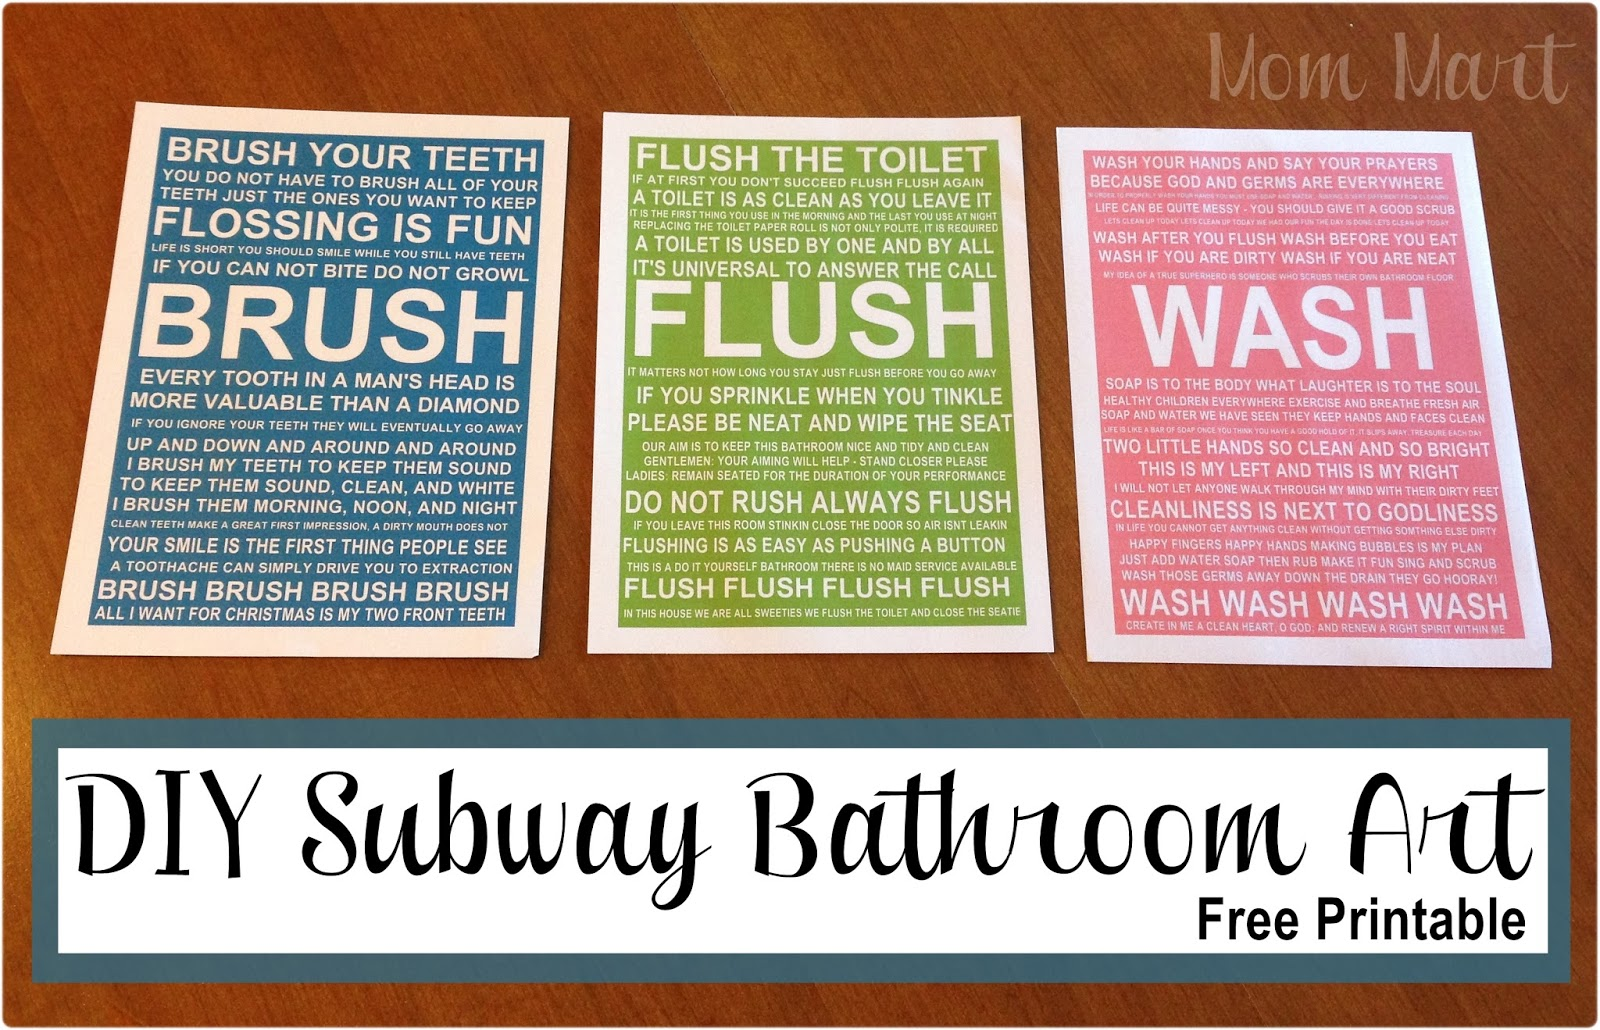 Free Printable Bathroom Art Mom Mart Diy Bathroom Subway Art Freeprintable